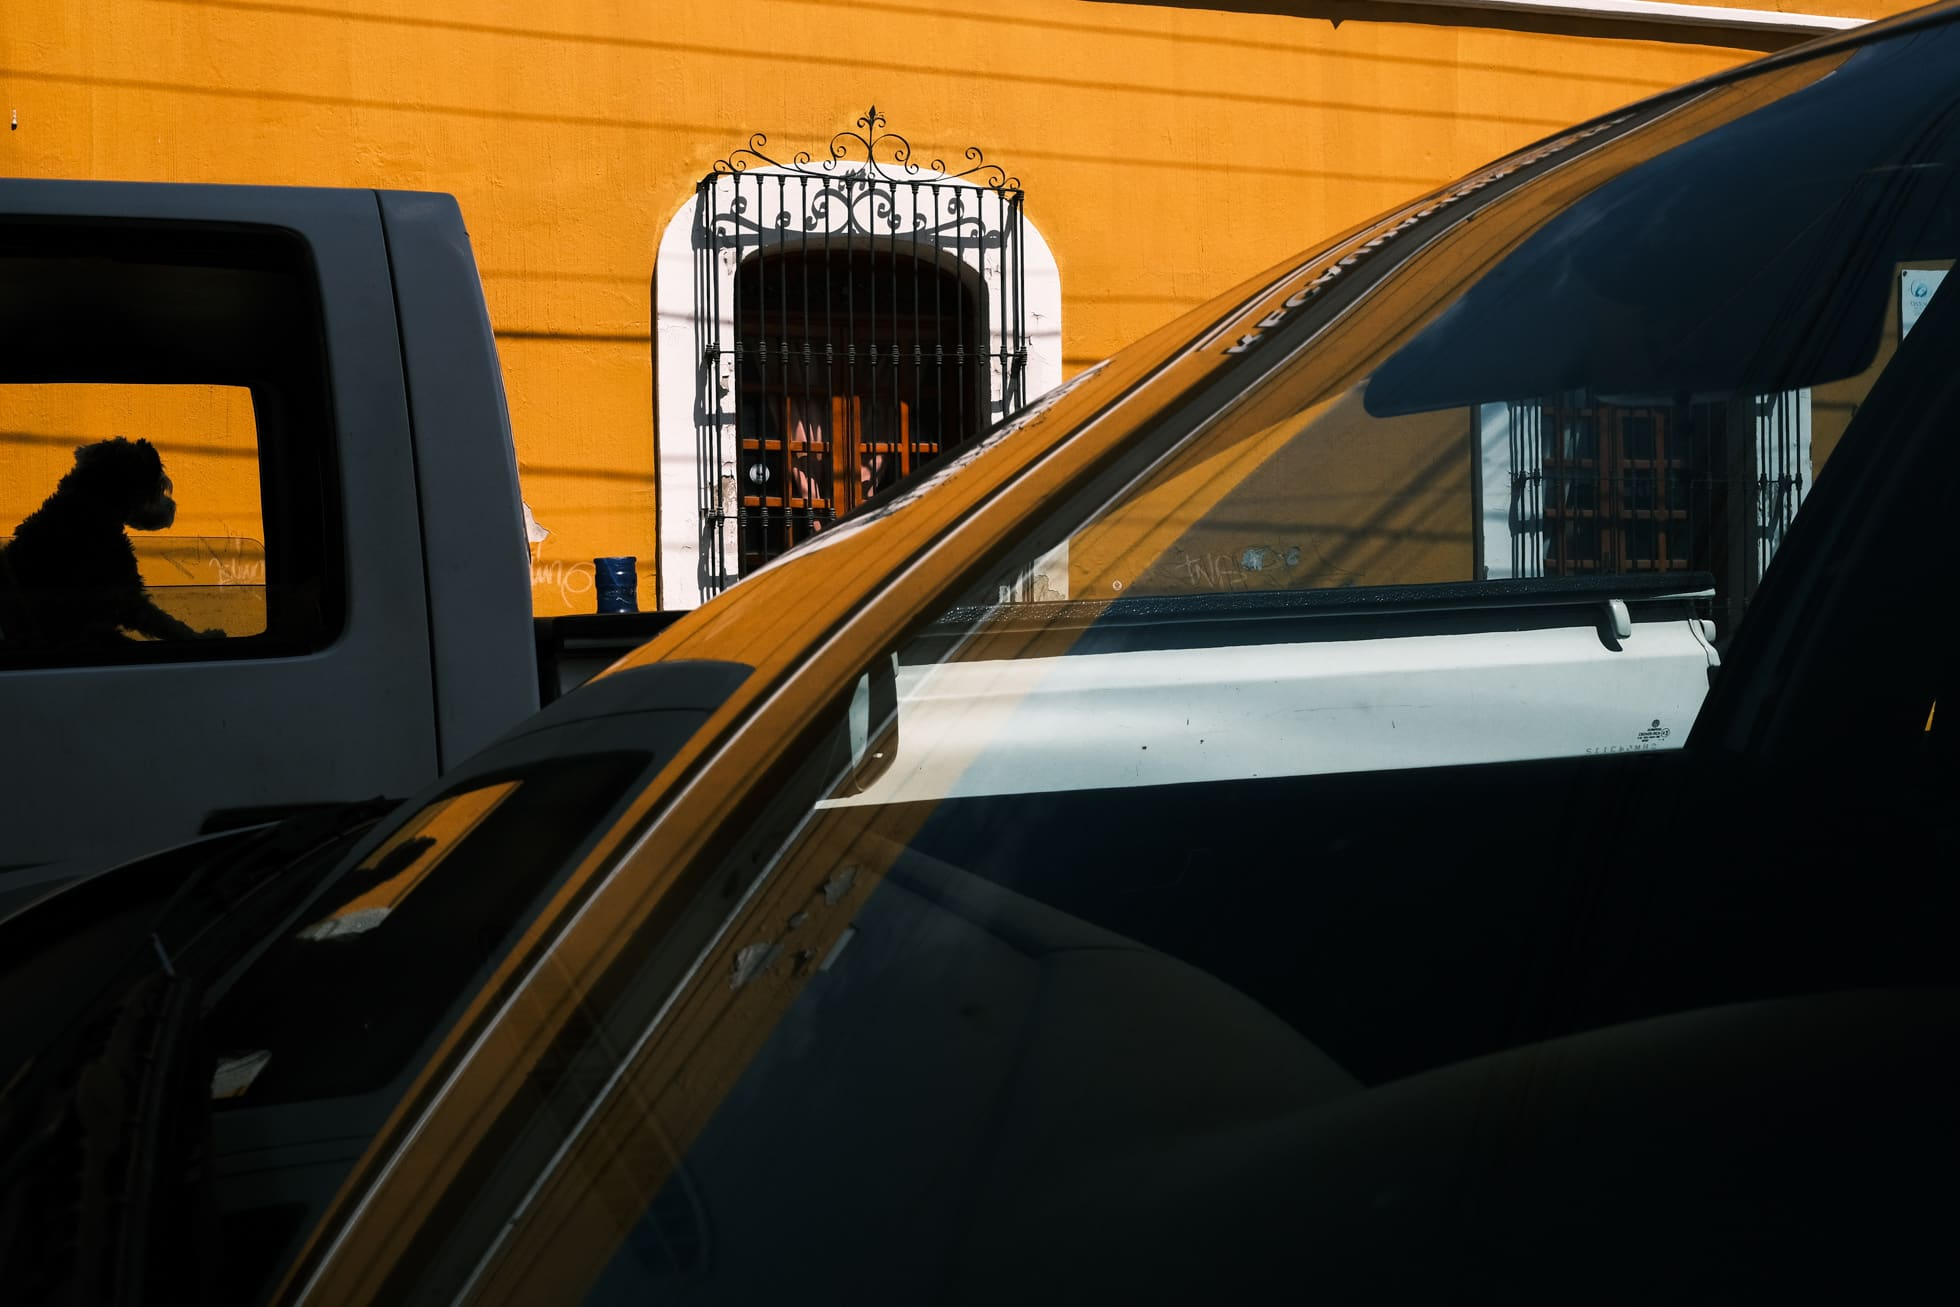 fujifilm-x-pro3-mexico-street-photography-56